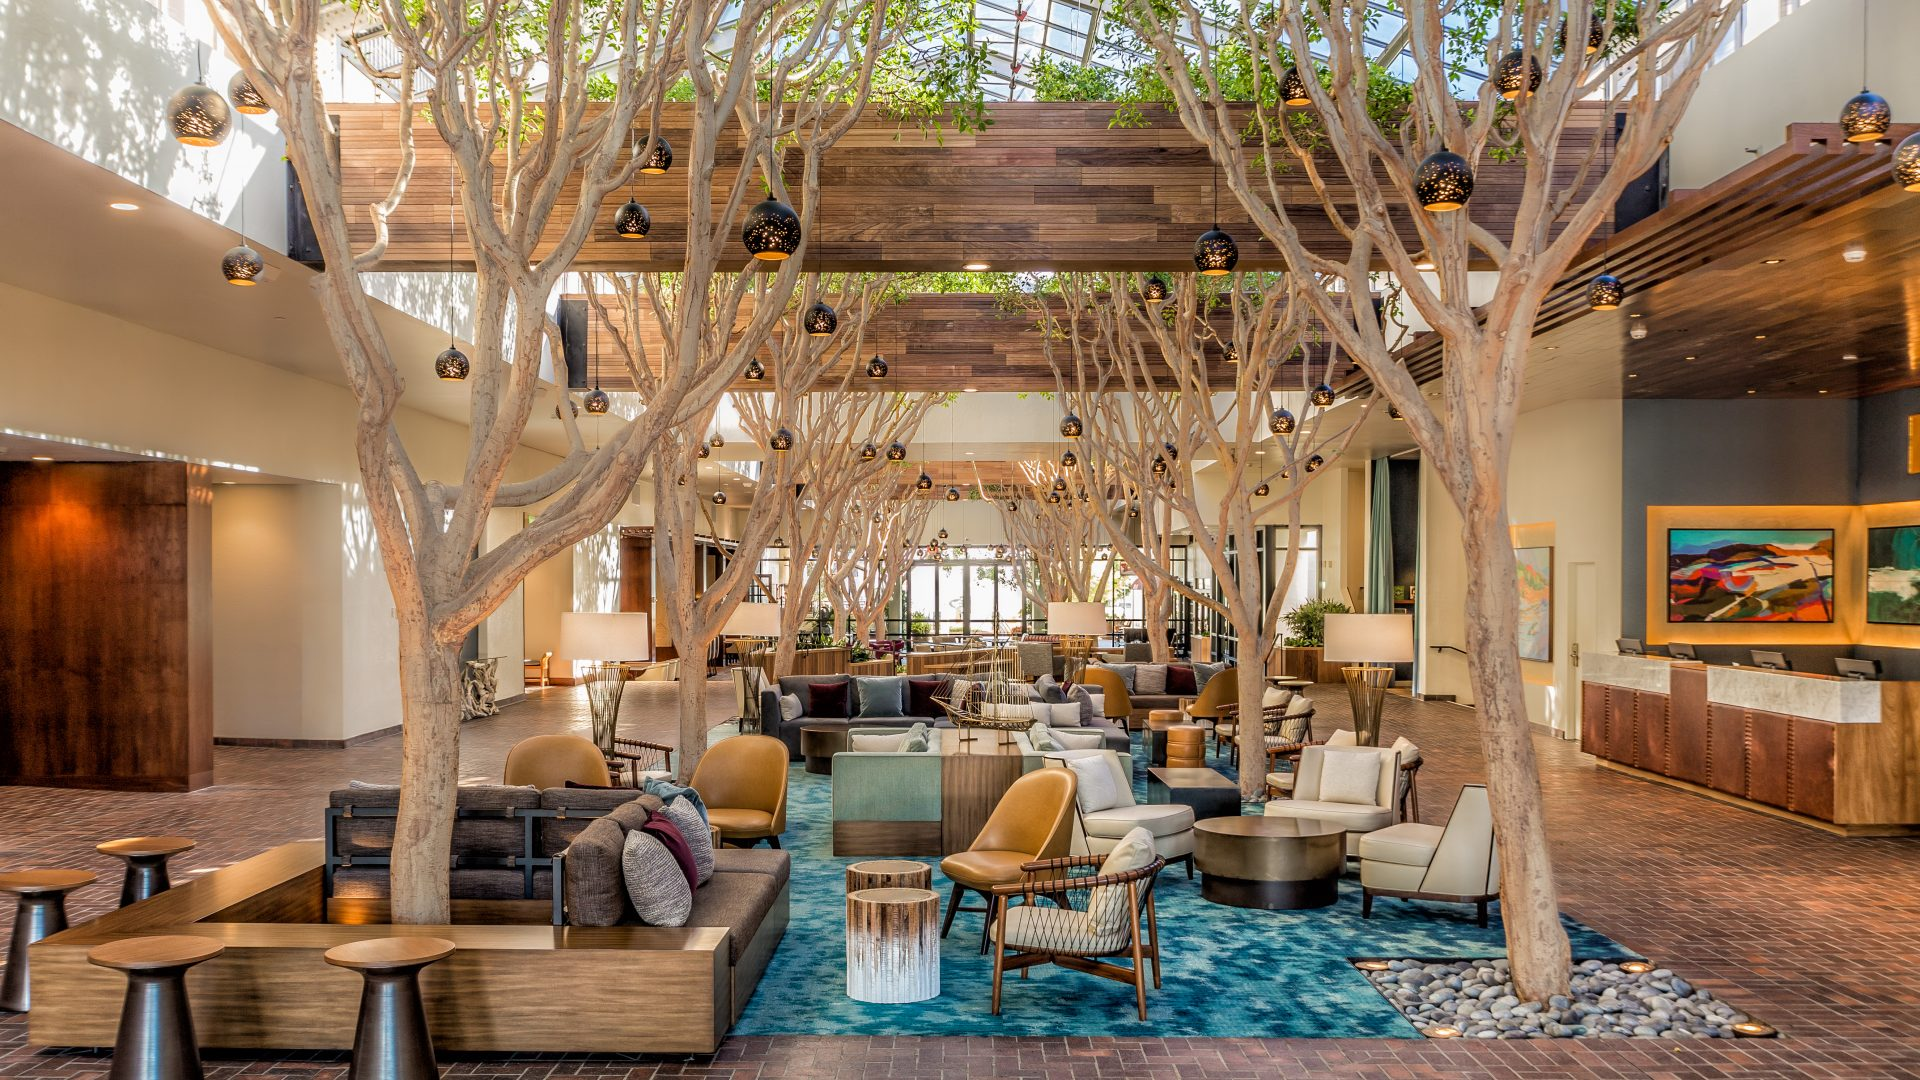 Portola Hotel & Spa at Monterey Bay image 1